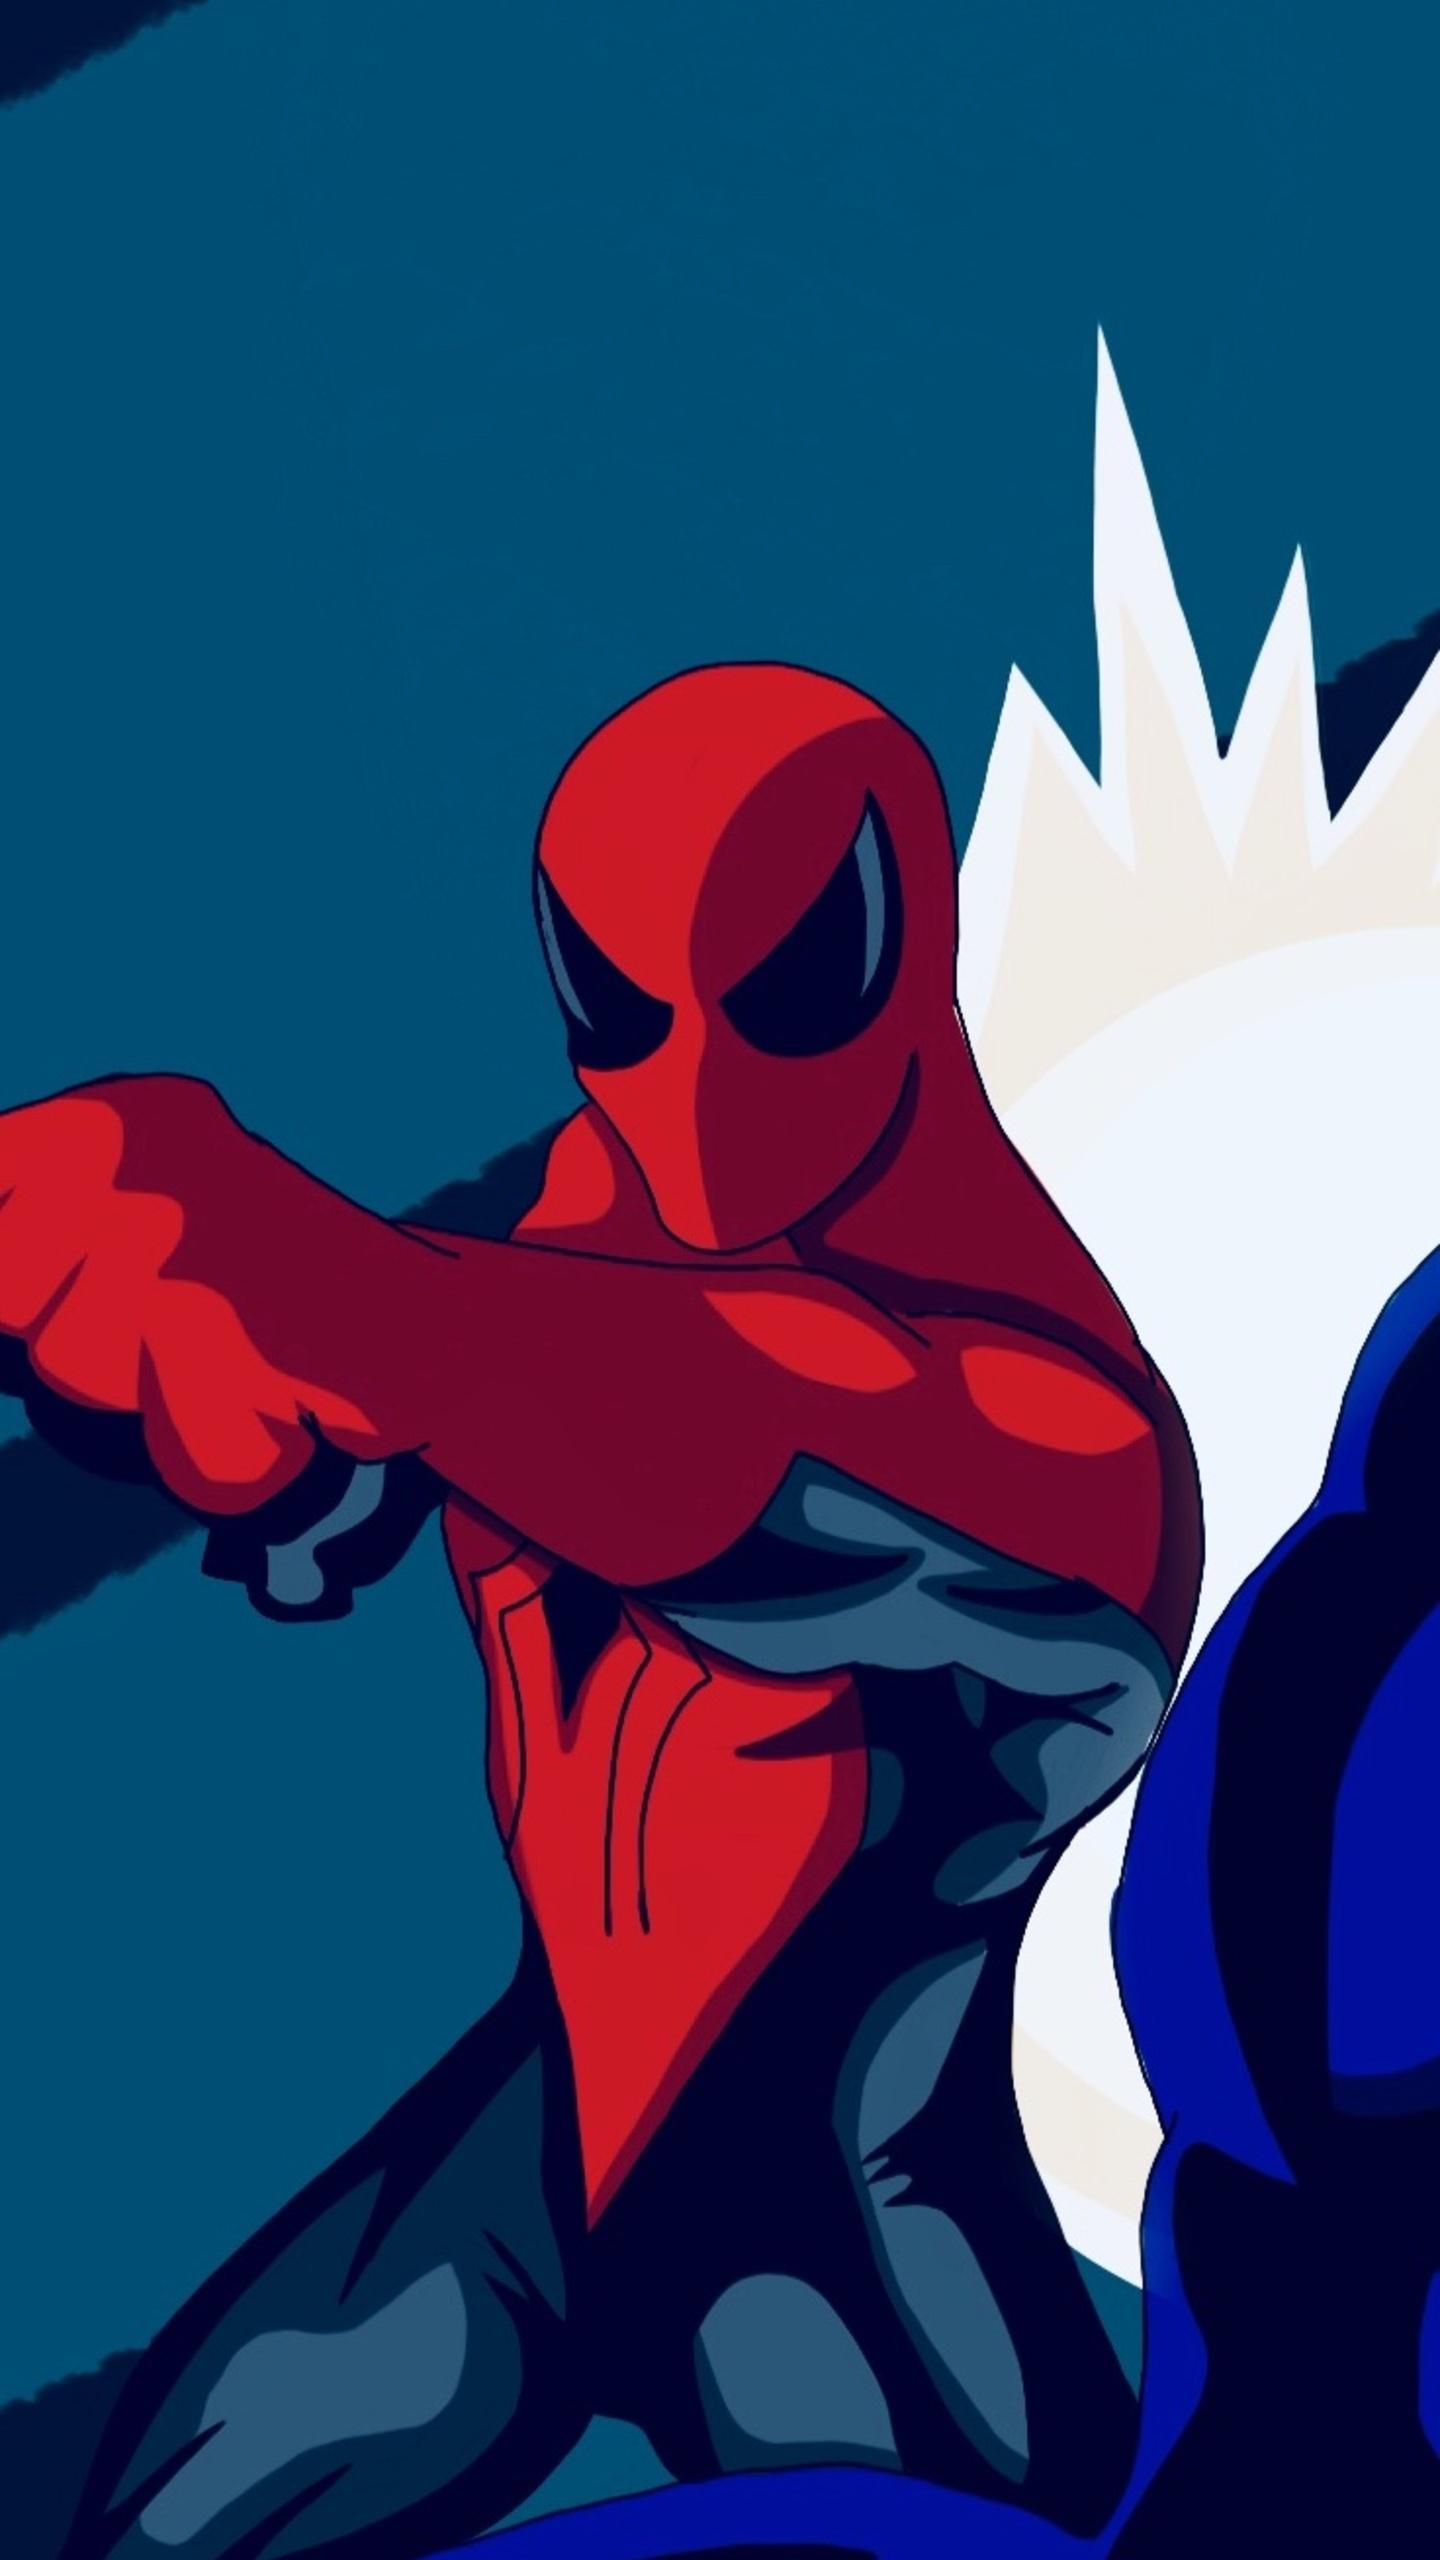 1440x2560 Spiderman Vs Venom Artwork Samsung Galaxy S6 S7 Google